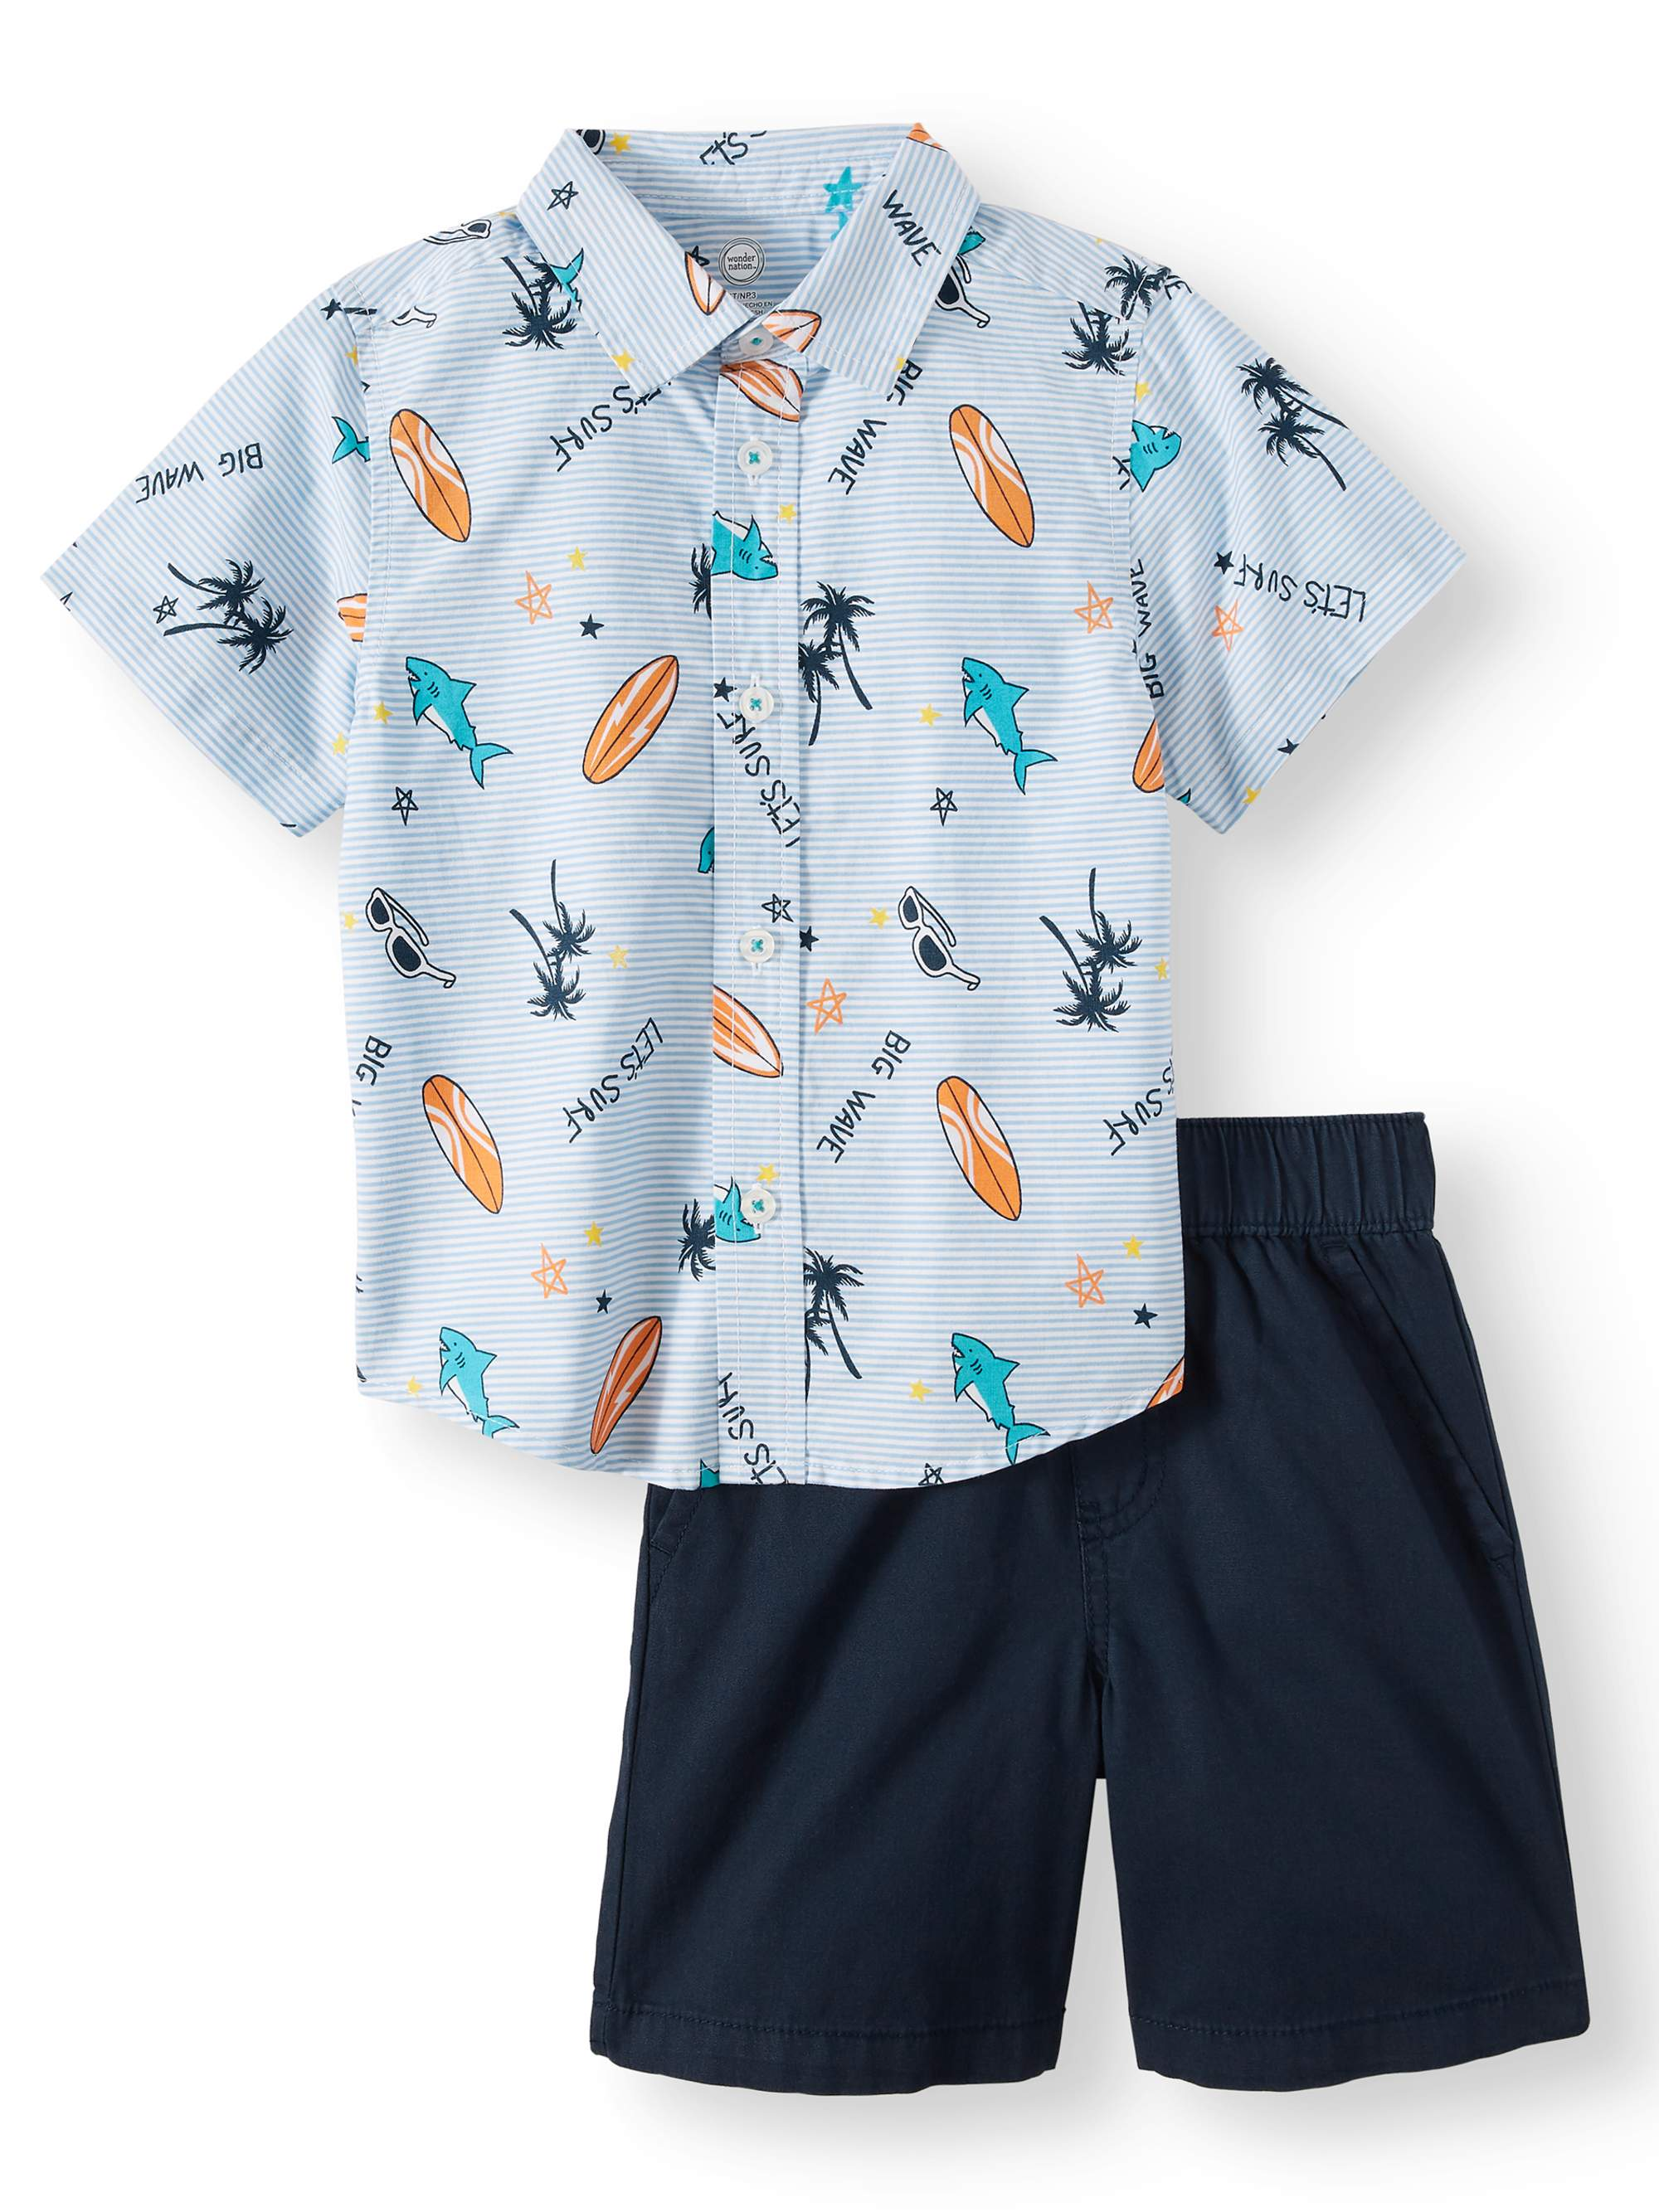 f271b35a4 Wonder Nation - Short Sleeve Button Down & Shorts, 2pc Outfit Set (Toddler  Boys) - Walmart.com